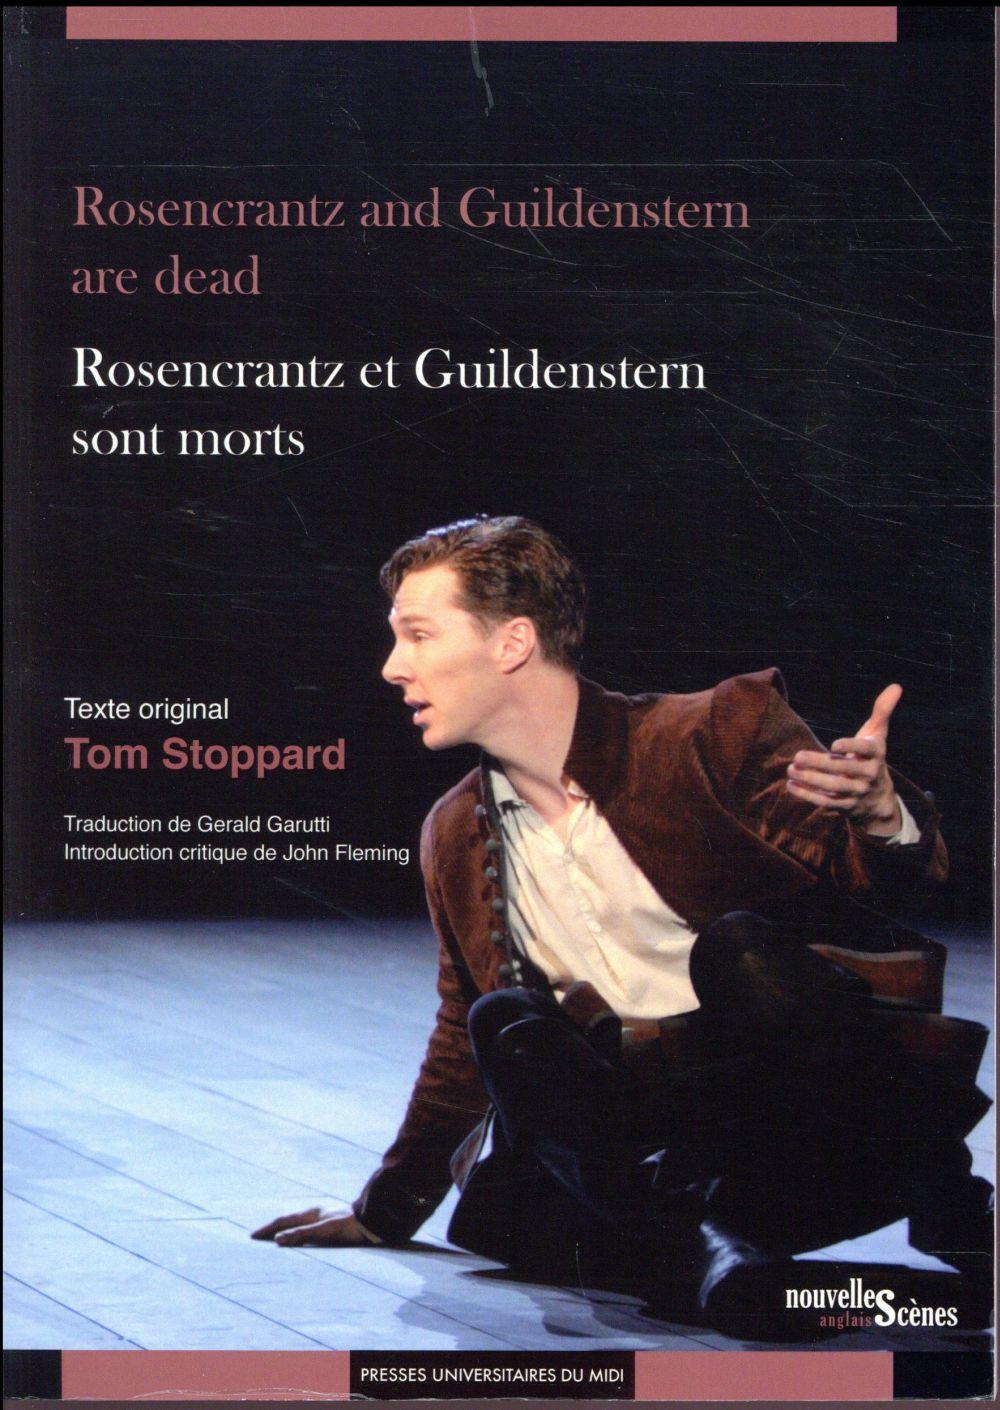 Rosencrantz and Guildenstern are dead / Rosencrantz and Guildenstern sont morts